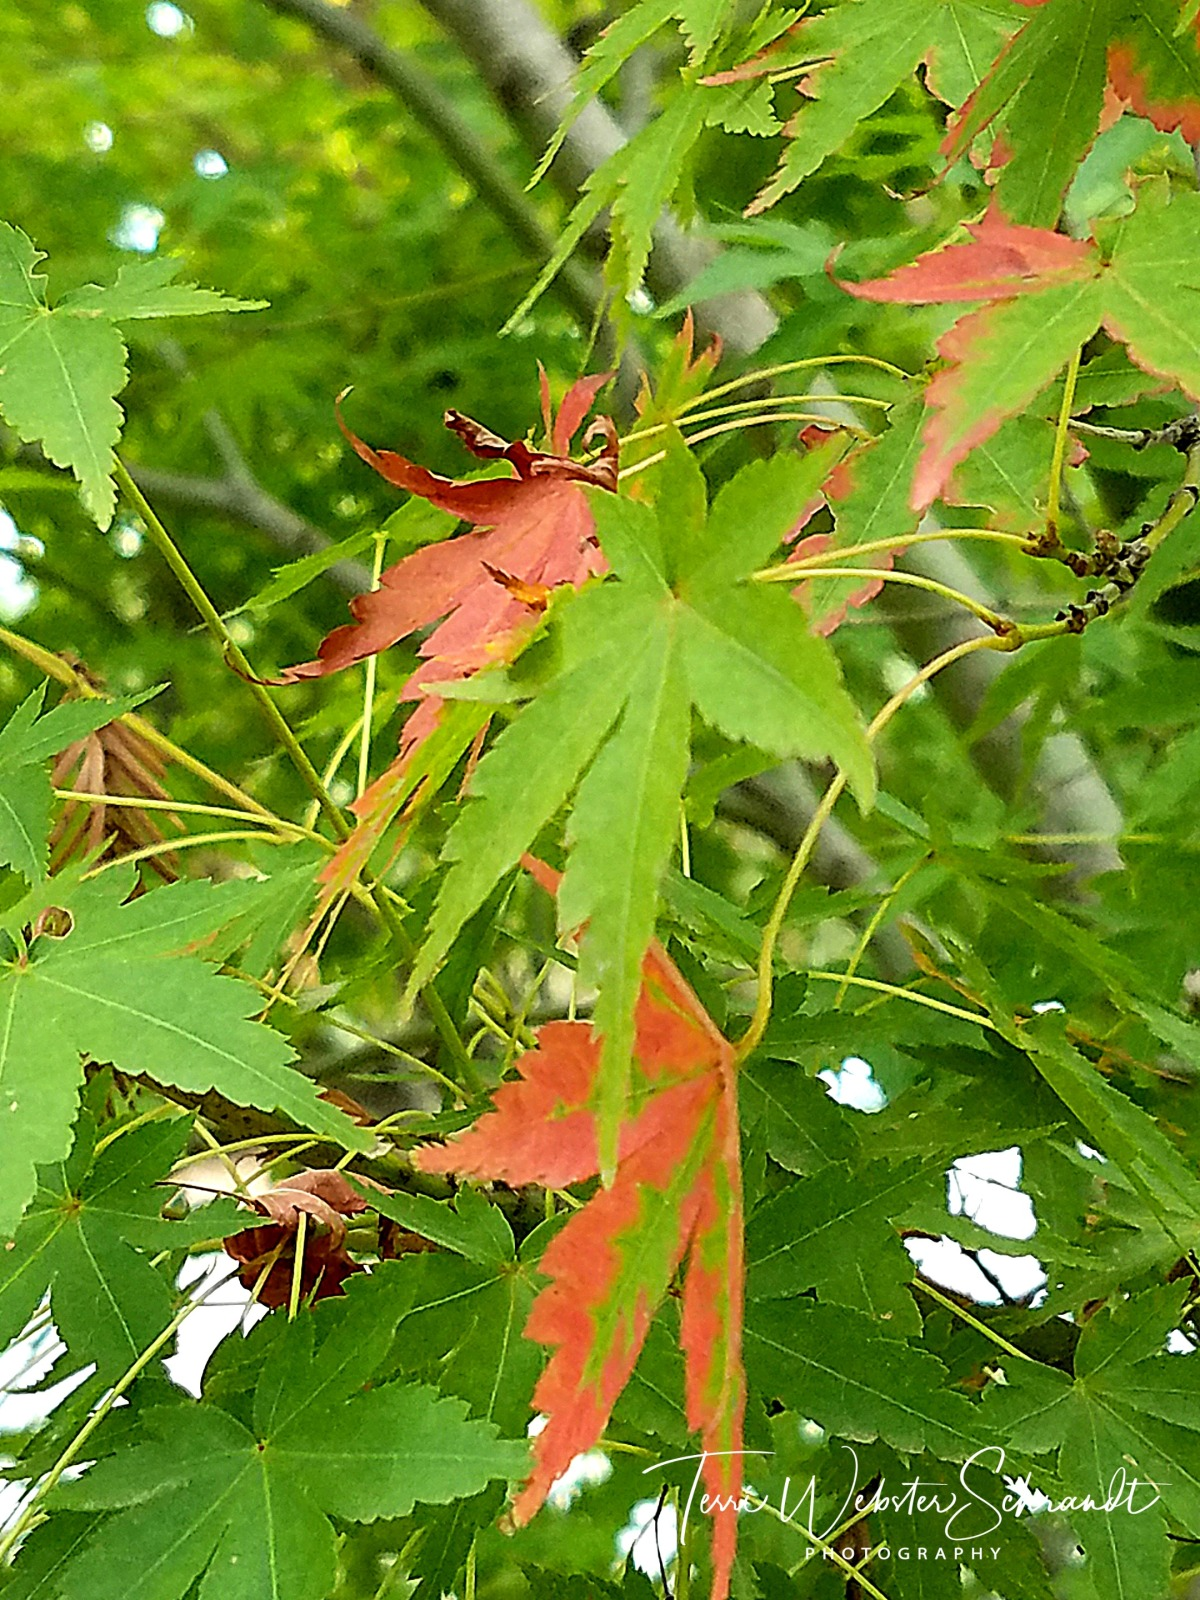 Green autumn leaves